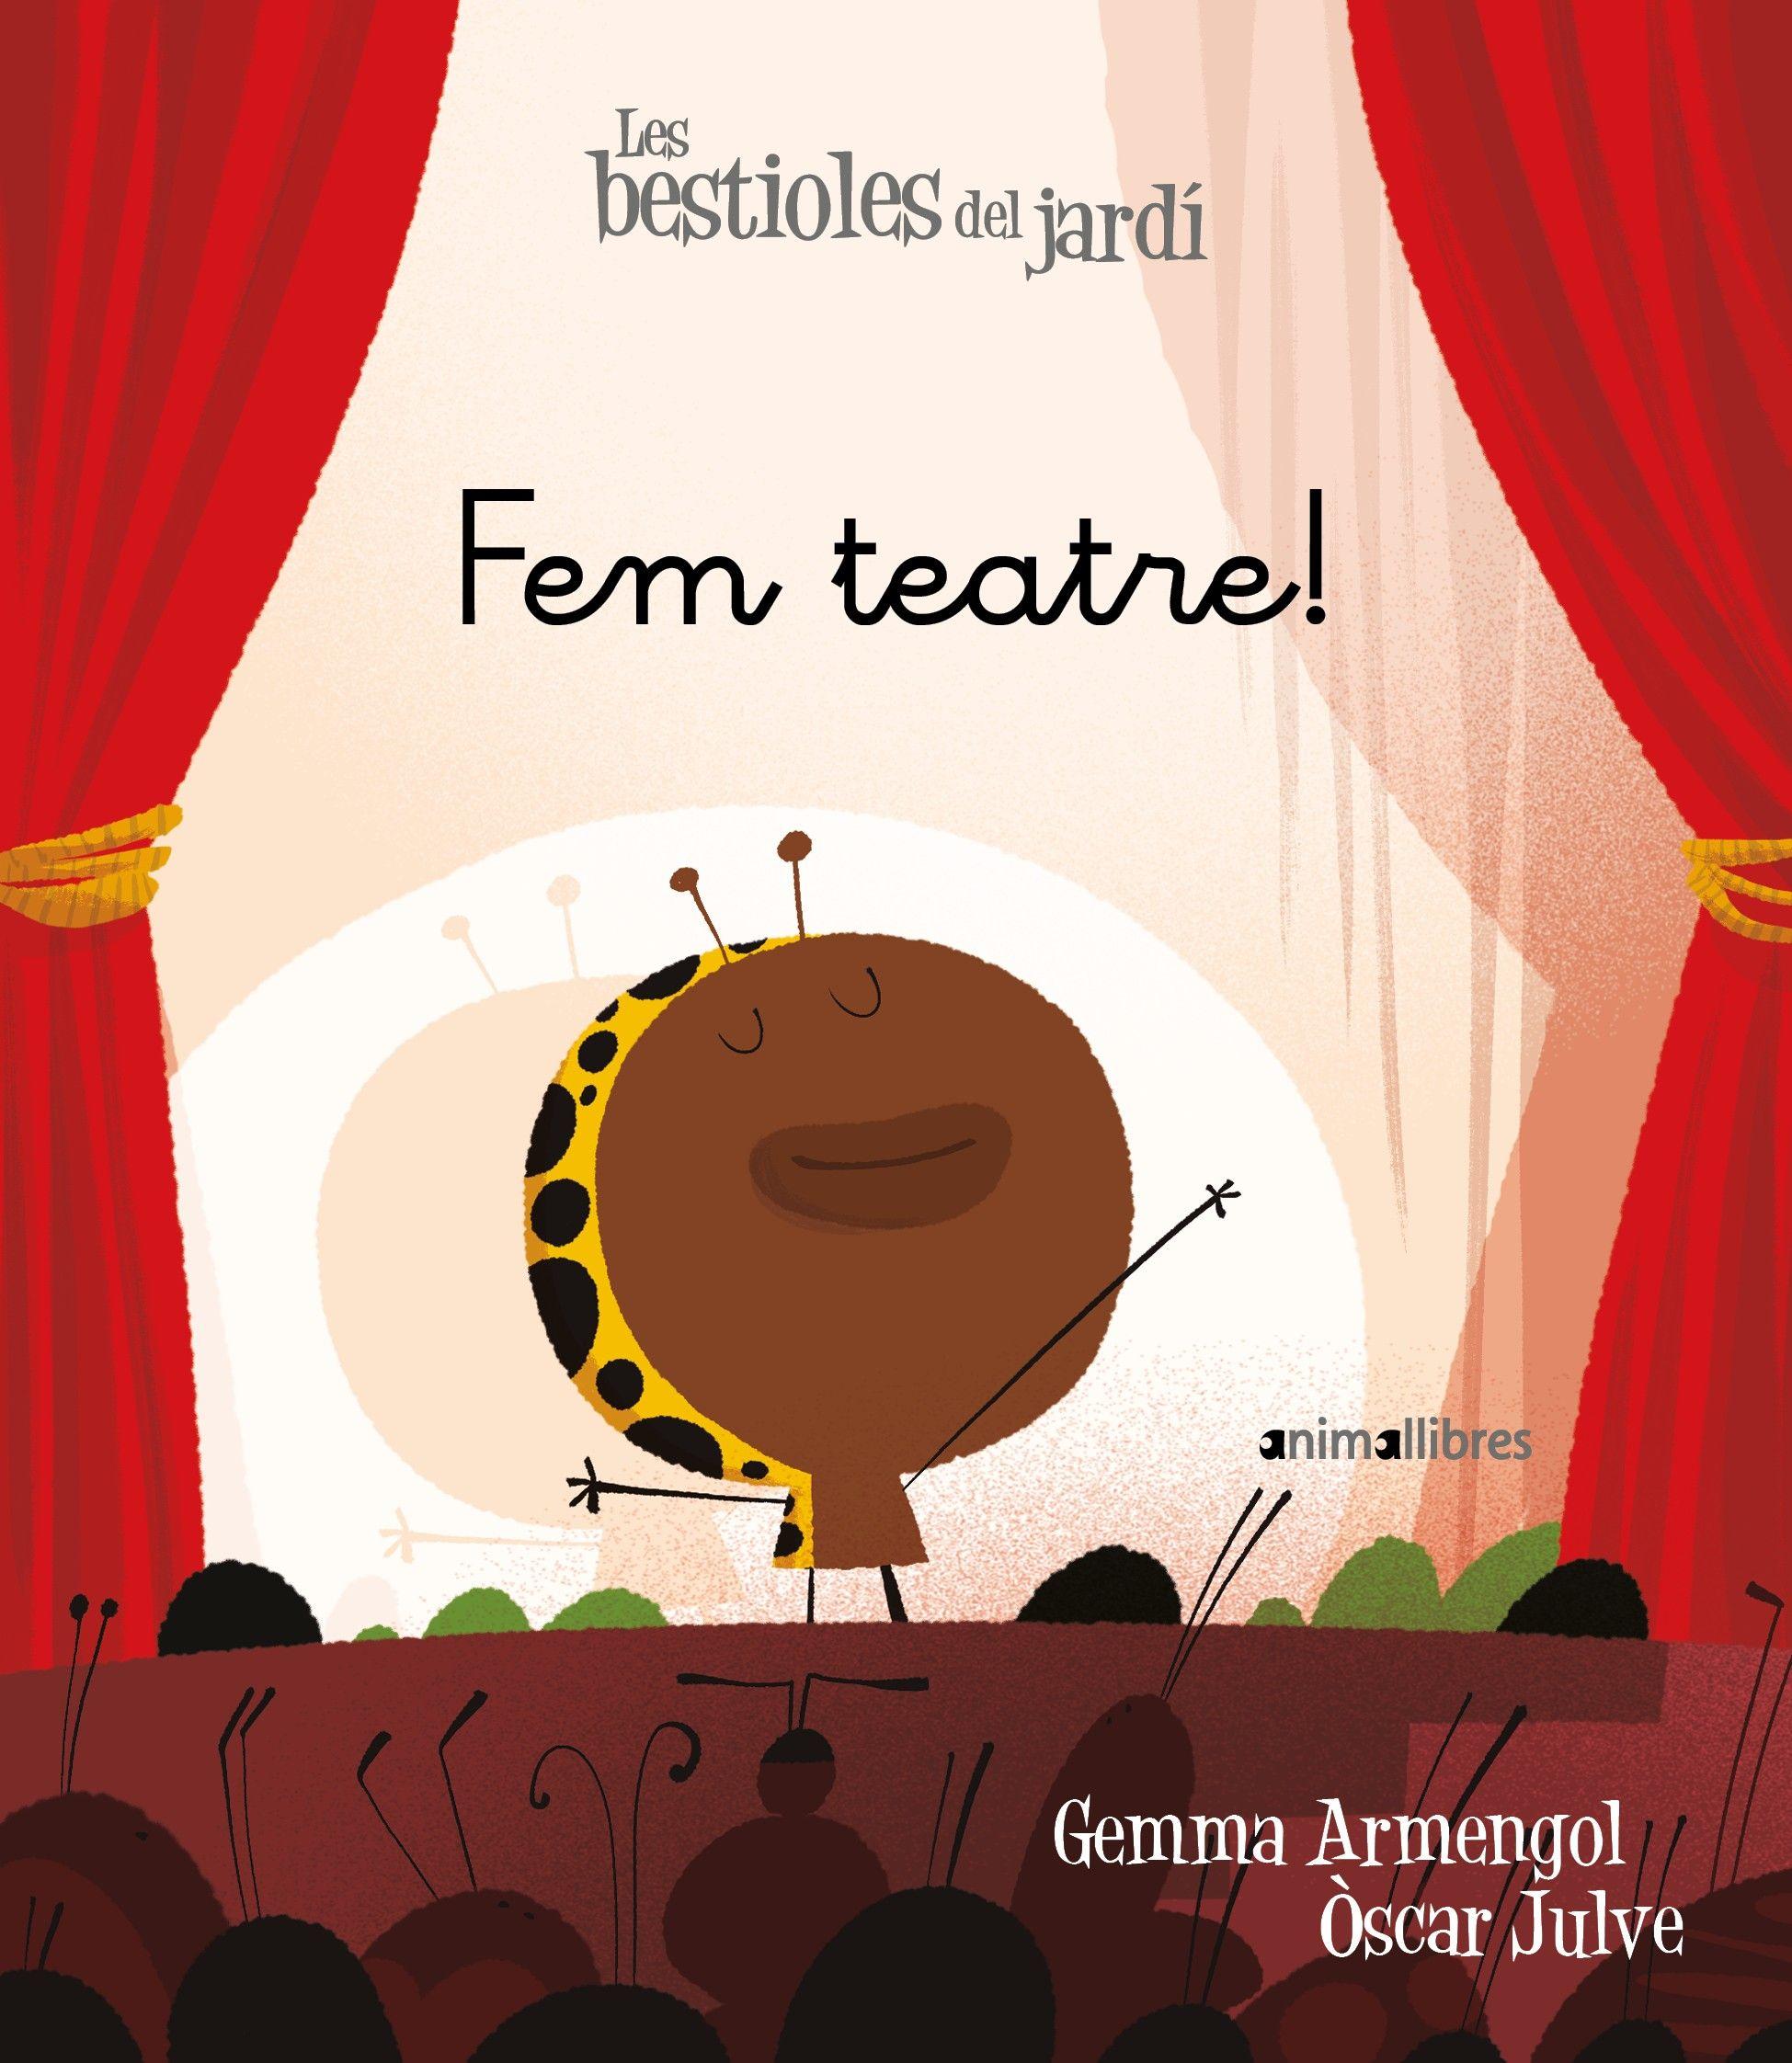 FEM TEATRE!